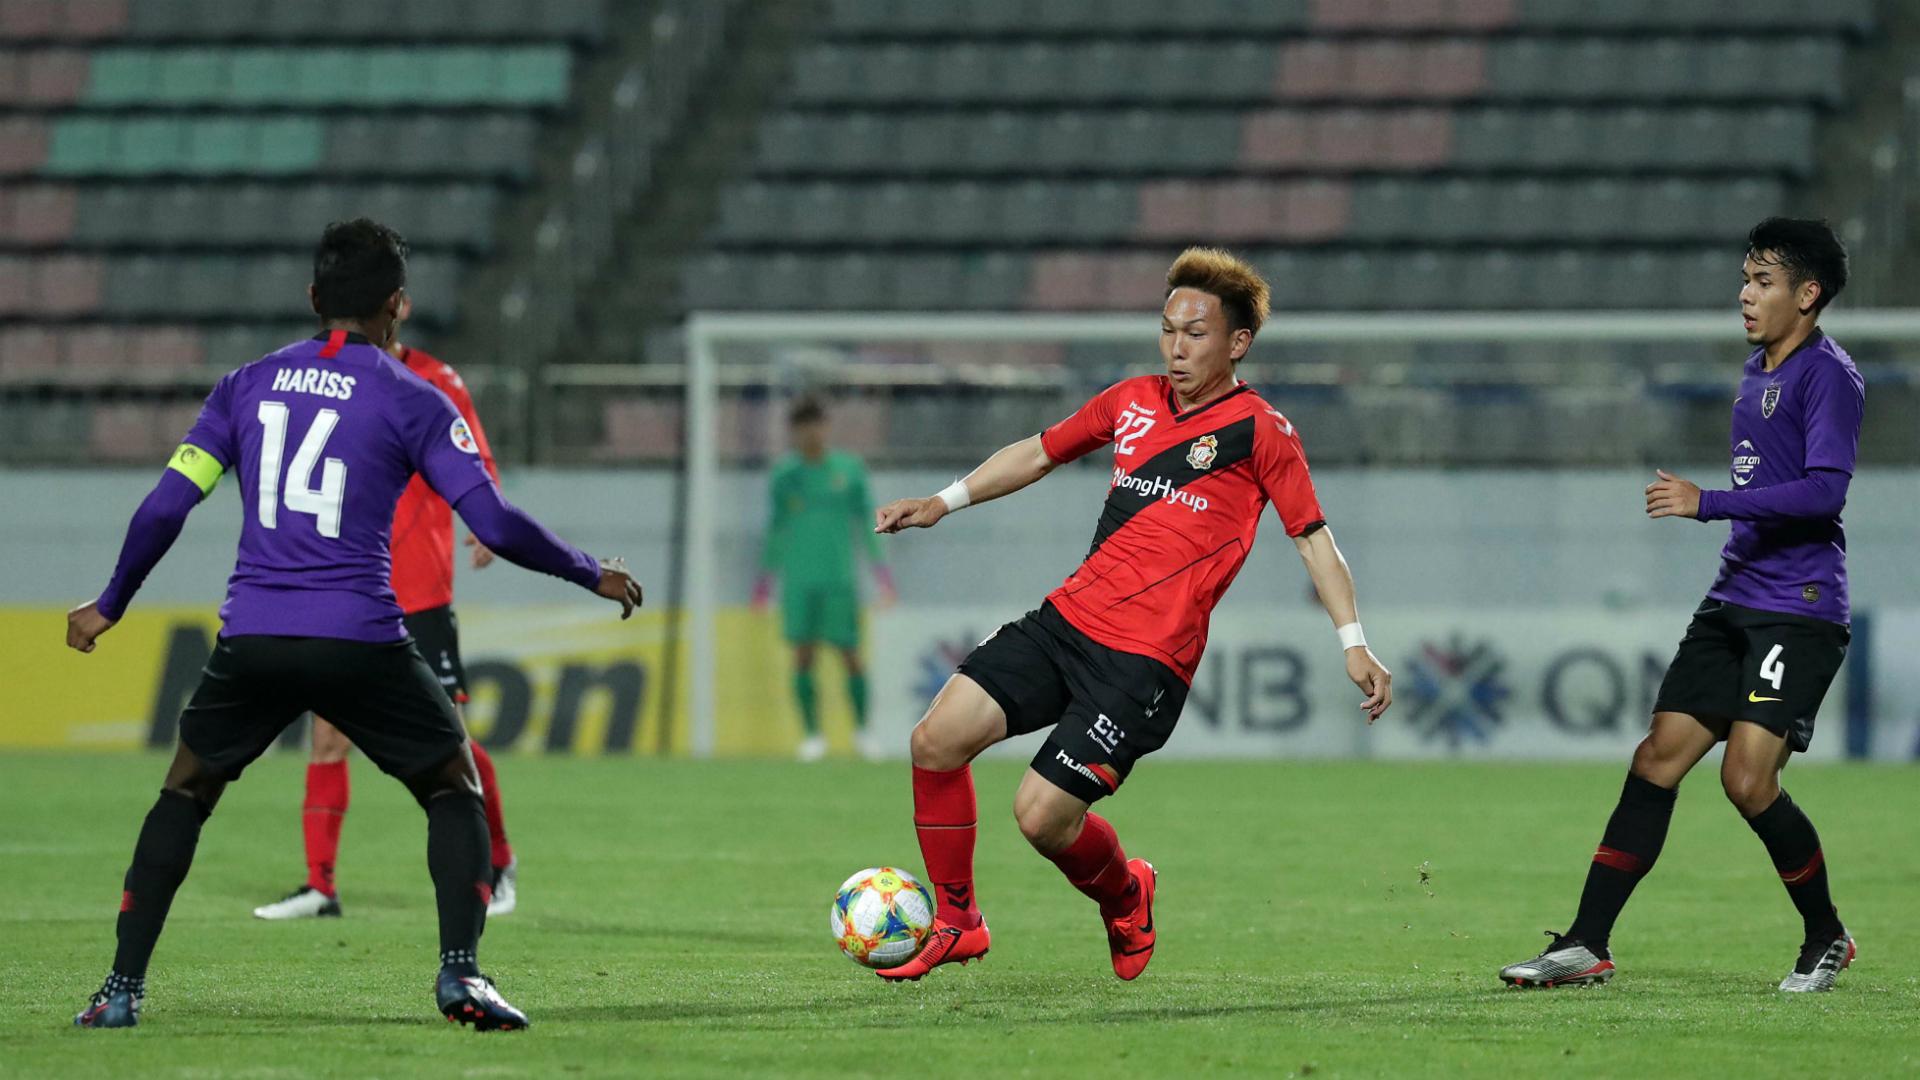 Afiq Fazail, Gyeongnam v Johor Darul Ta'zim, AFC Champions League, 22 May 2019